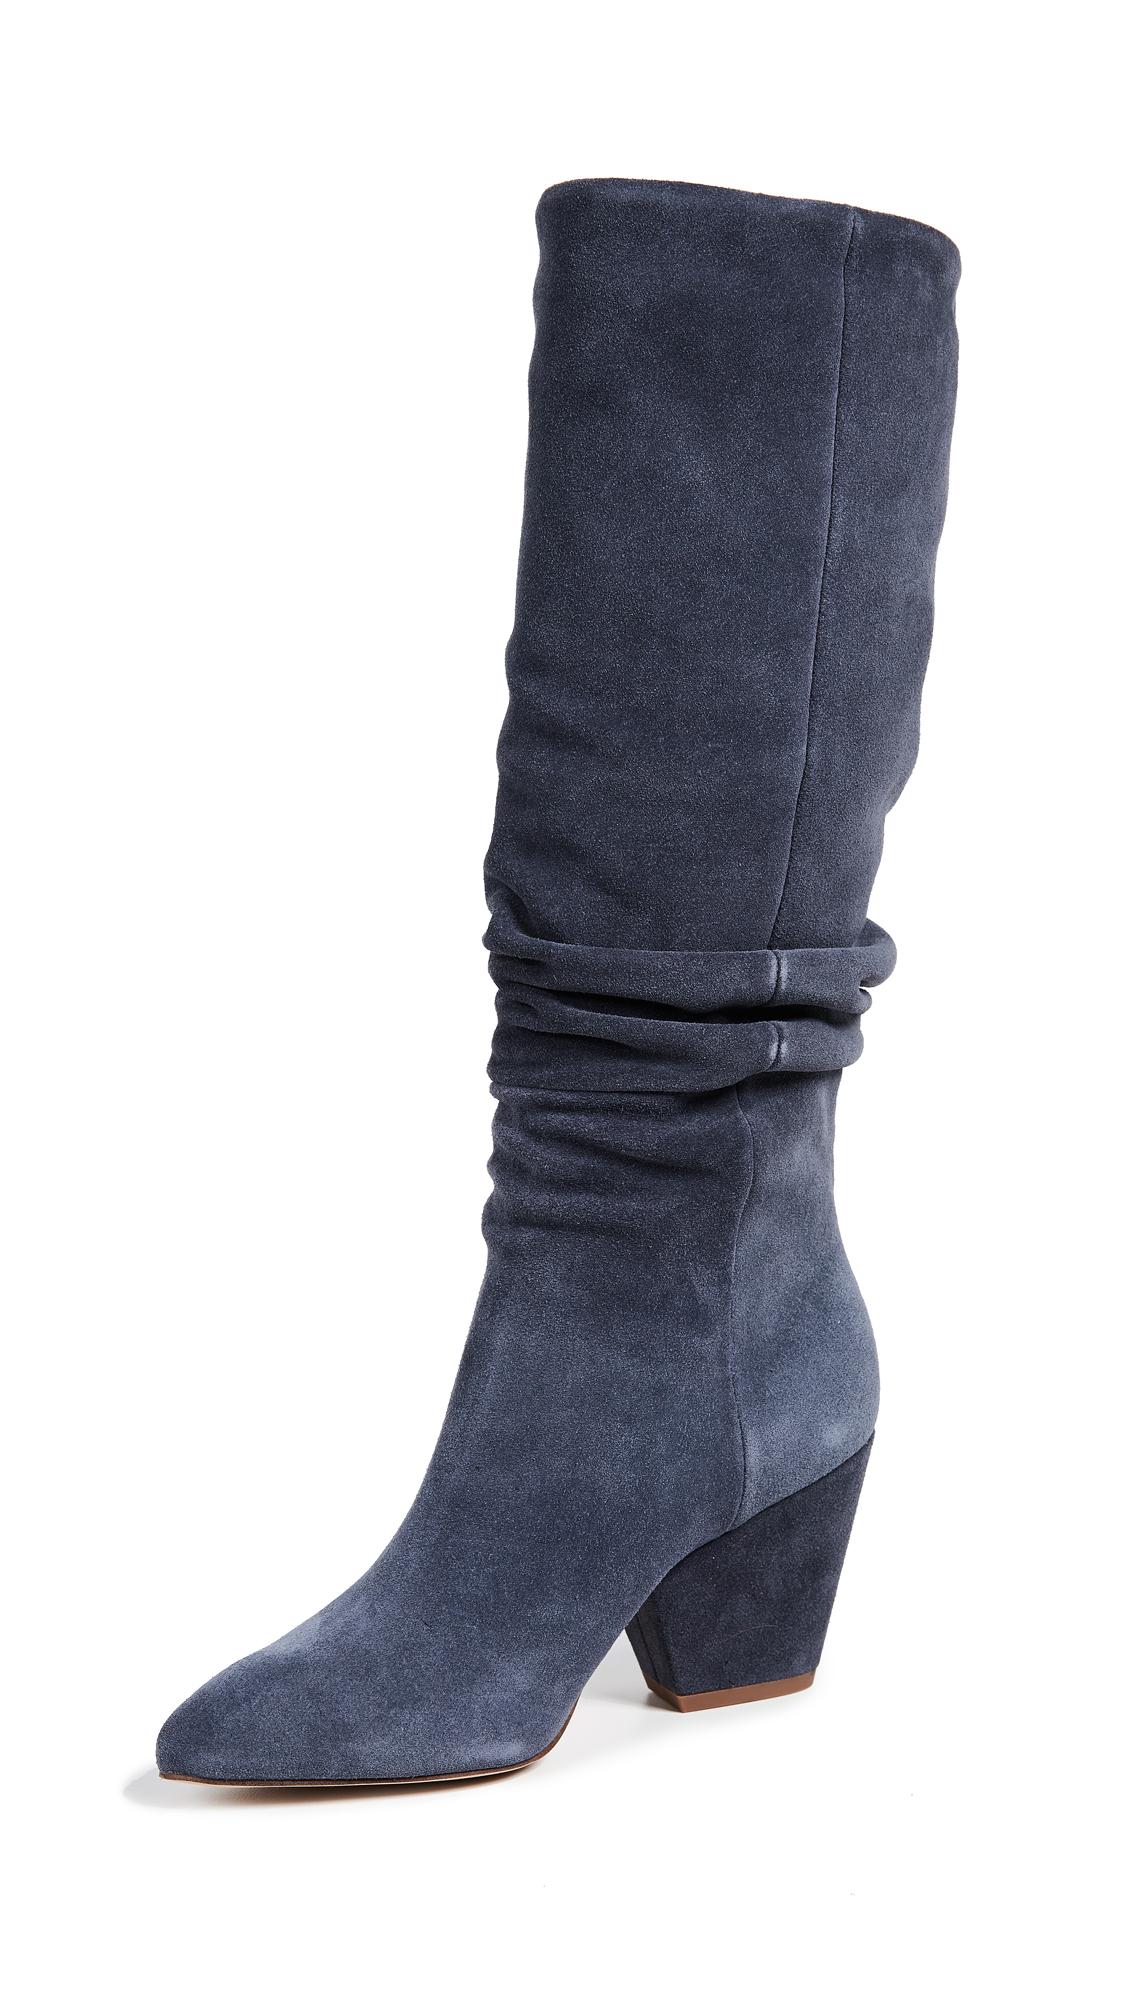 Splendid Clayton Tall Boots - Greystone